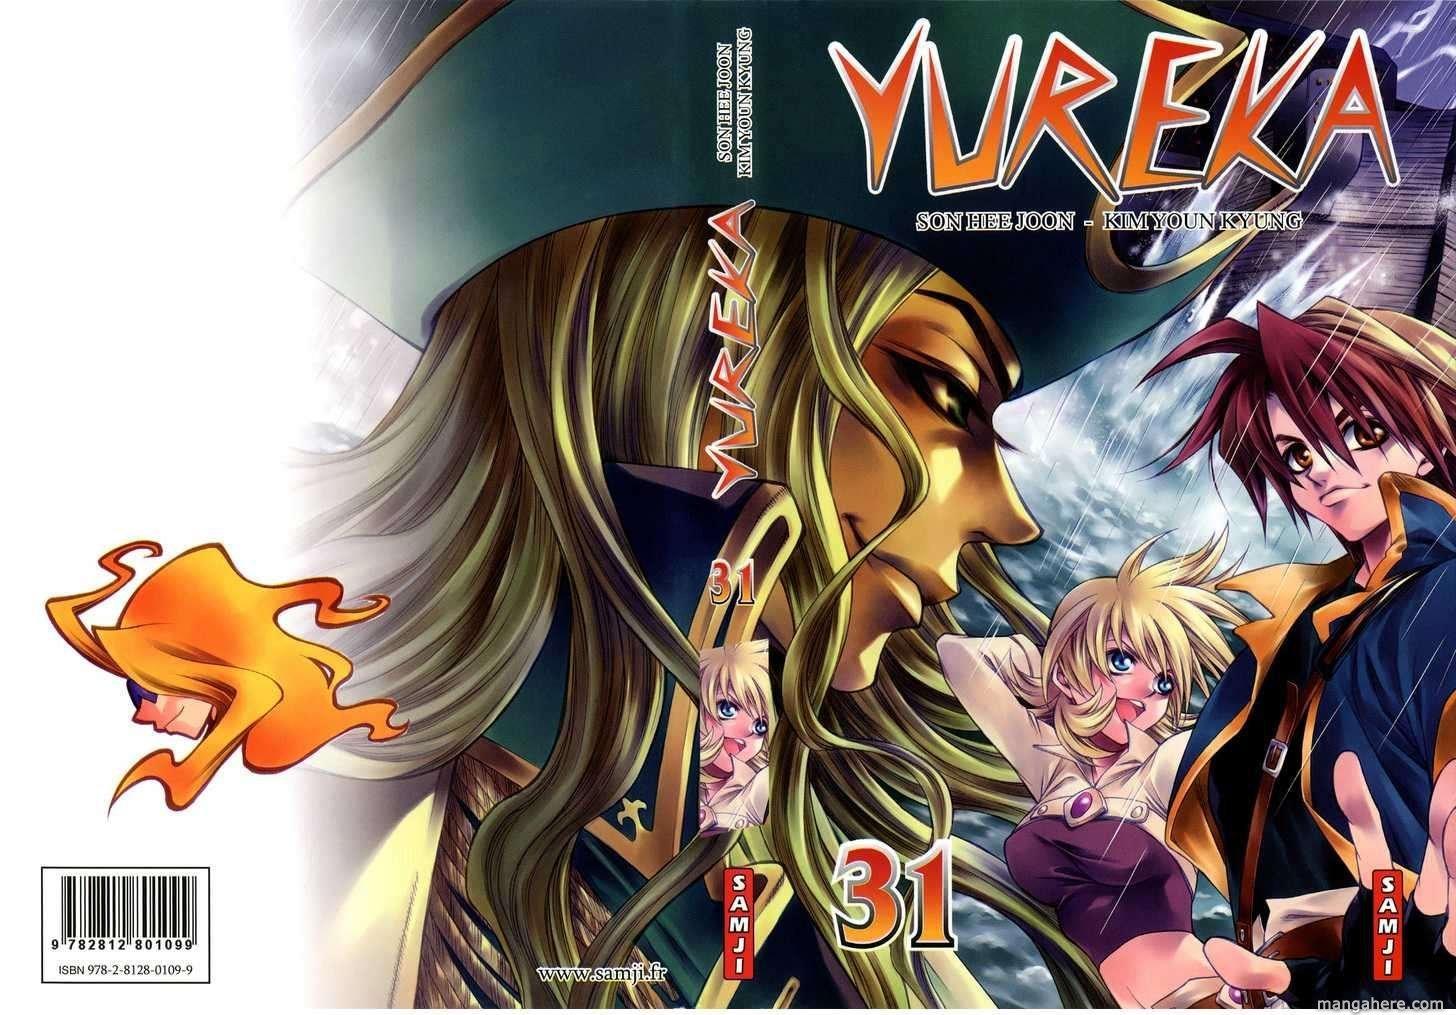 Yureka 192 Page 1